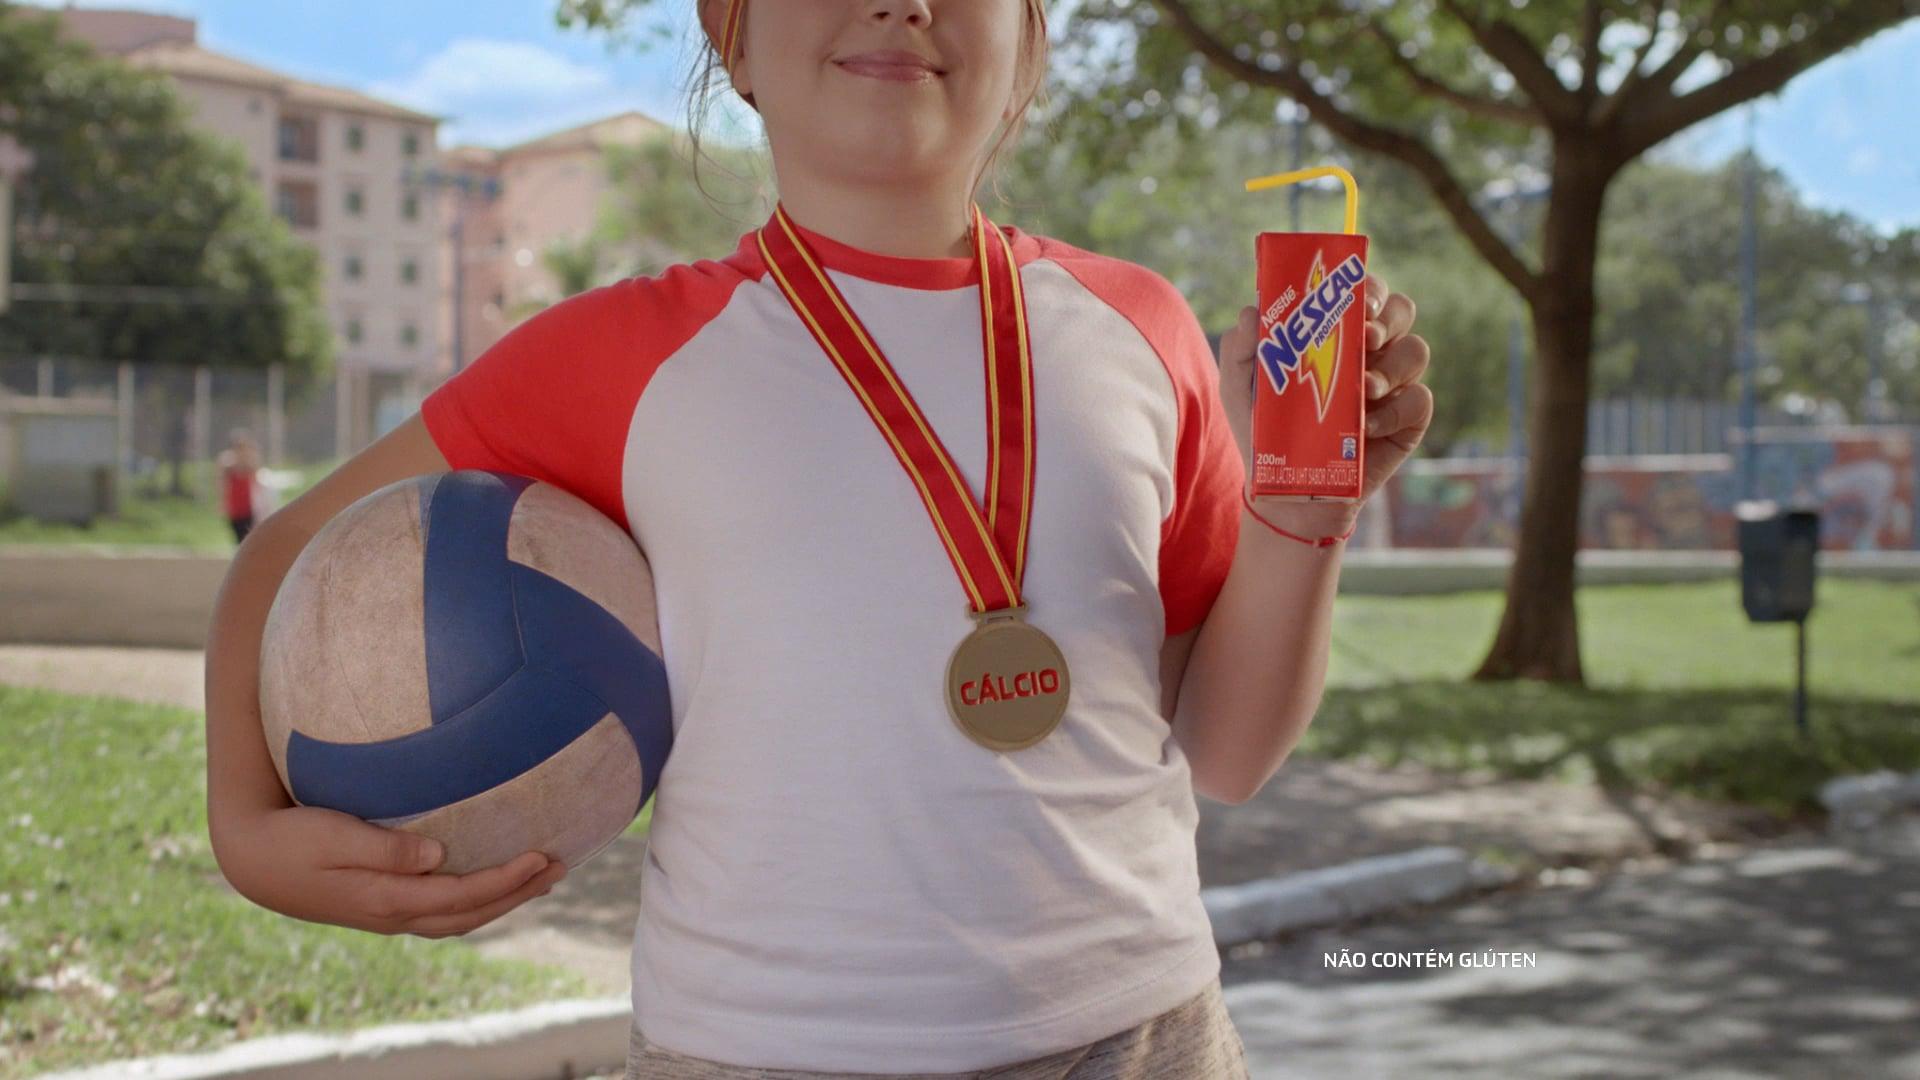 Nestle Nescau Medal